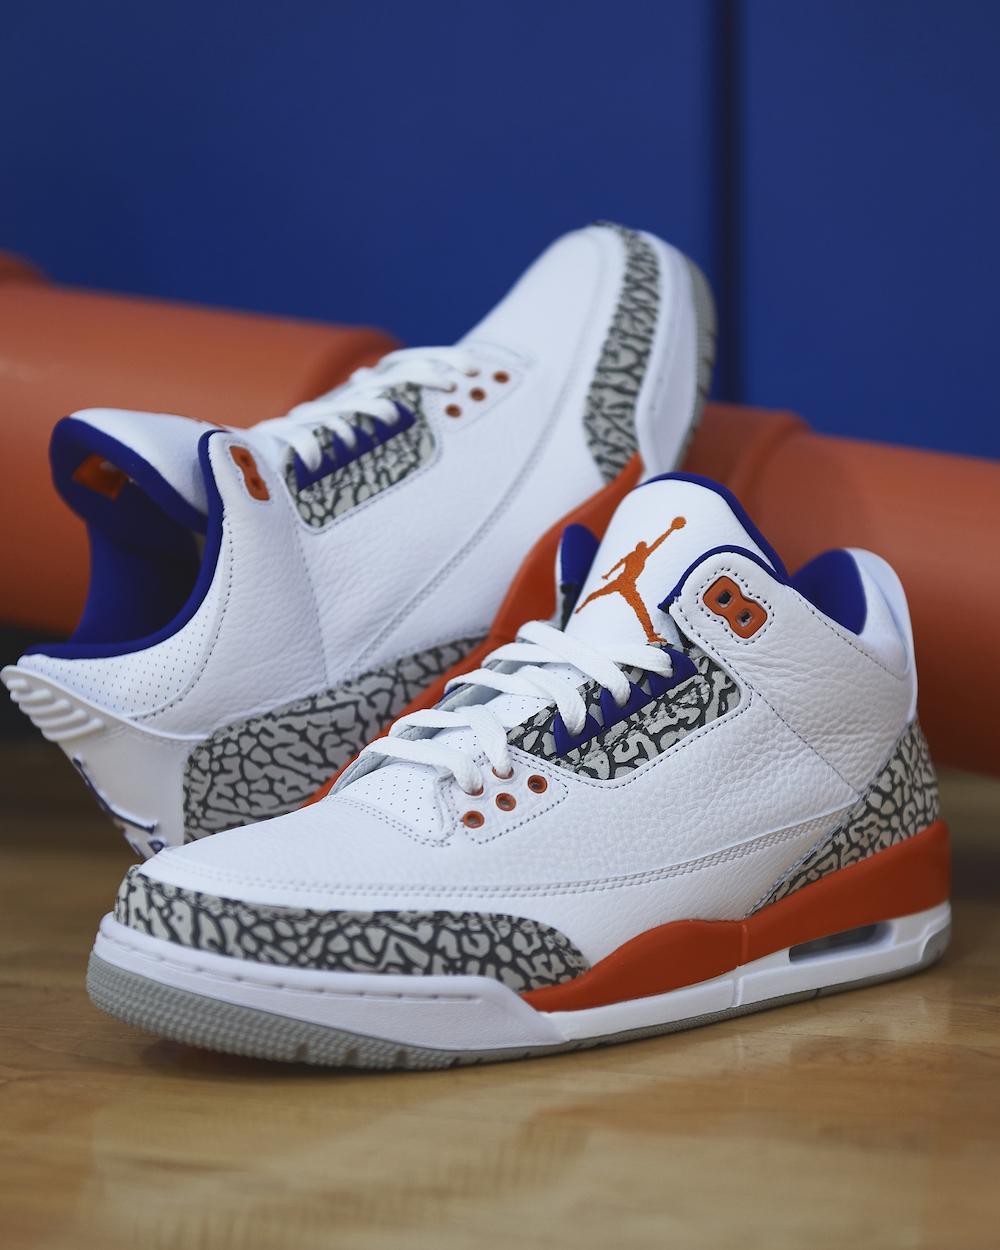 quality design 70051 358d6 Air Jordan 3 Knicks Rivals • KicksOnFire.com